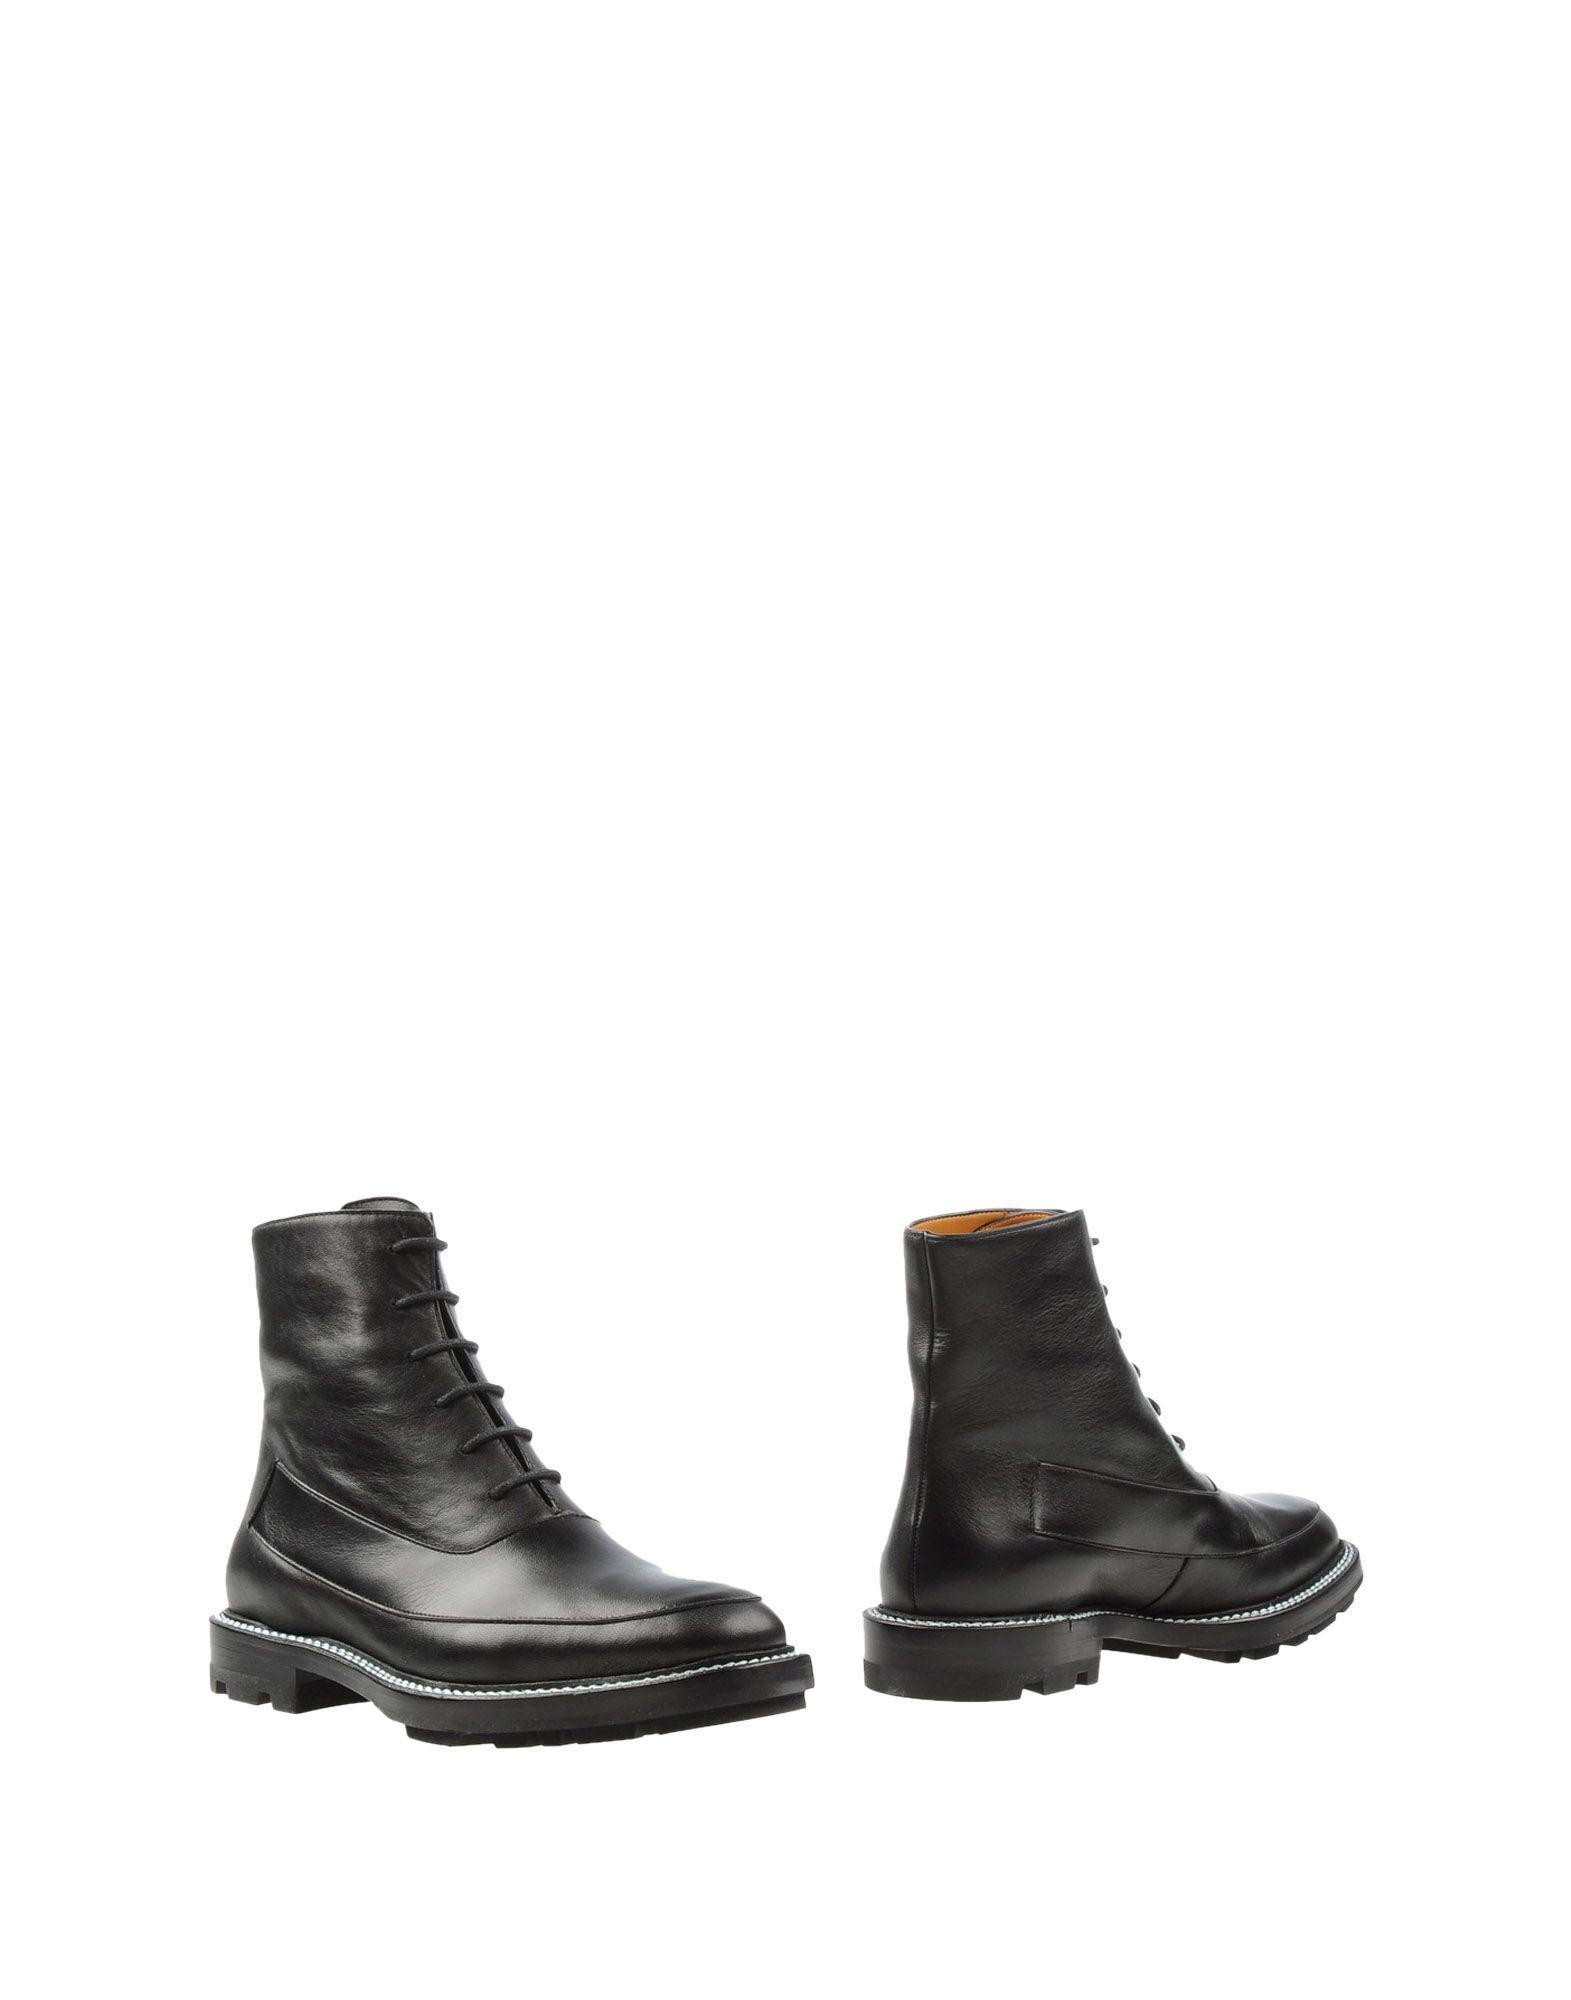 JIL SANDER Полусапоги и высокие ботинки lemon jelly полусапоги и высокие ботинки